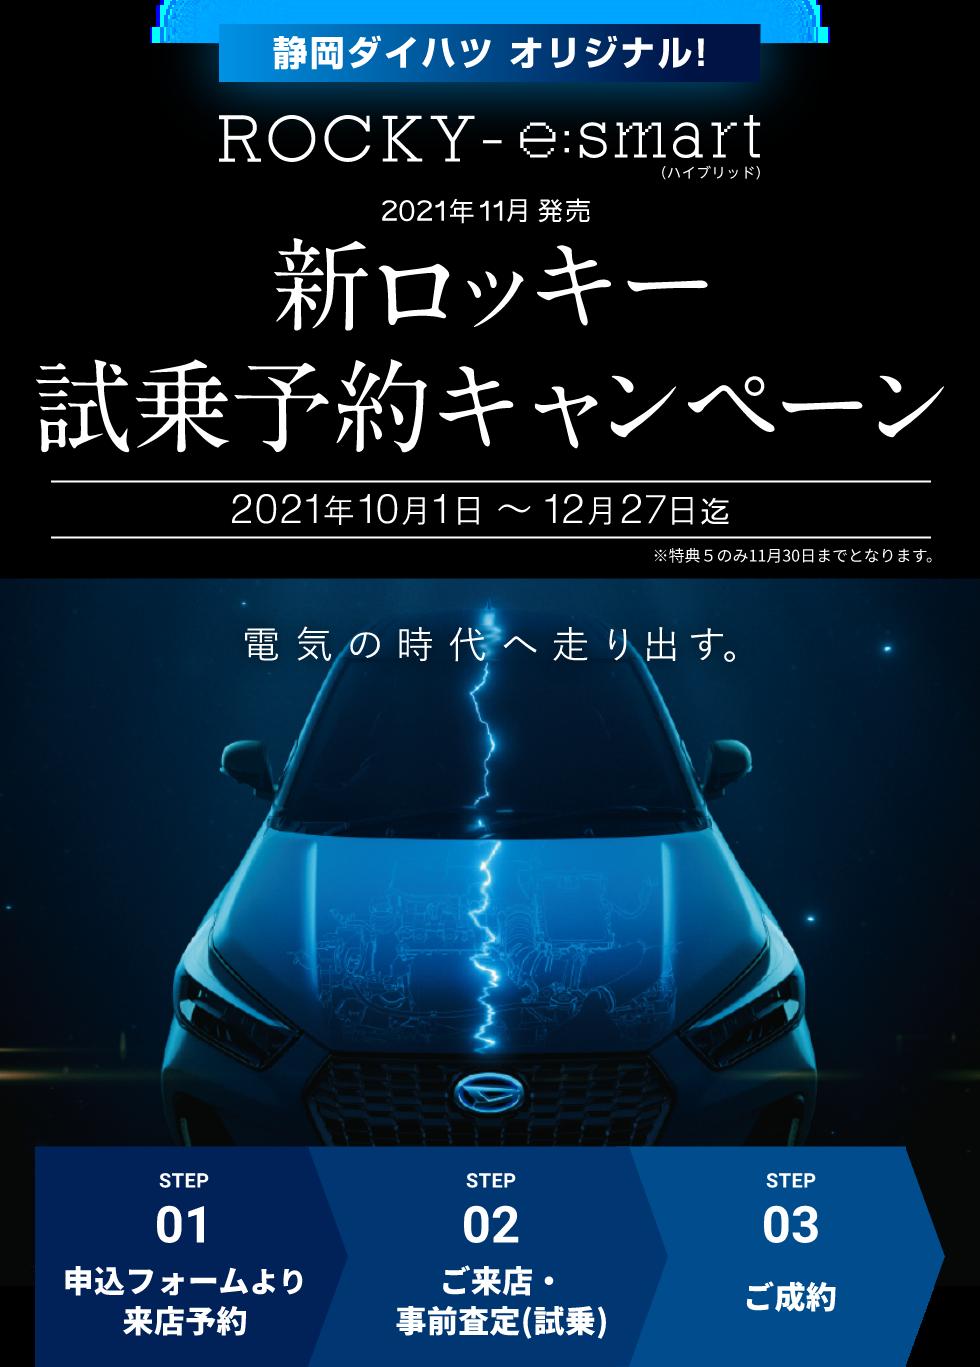 ROCKY-e:smart 新ロッキー 試乗予約キャンペーン 2021年10月1日〜12月27日迄